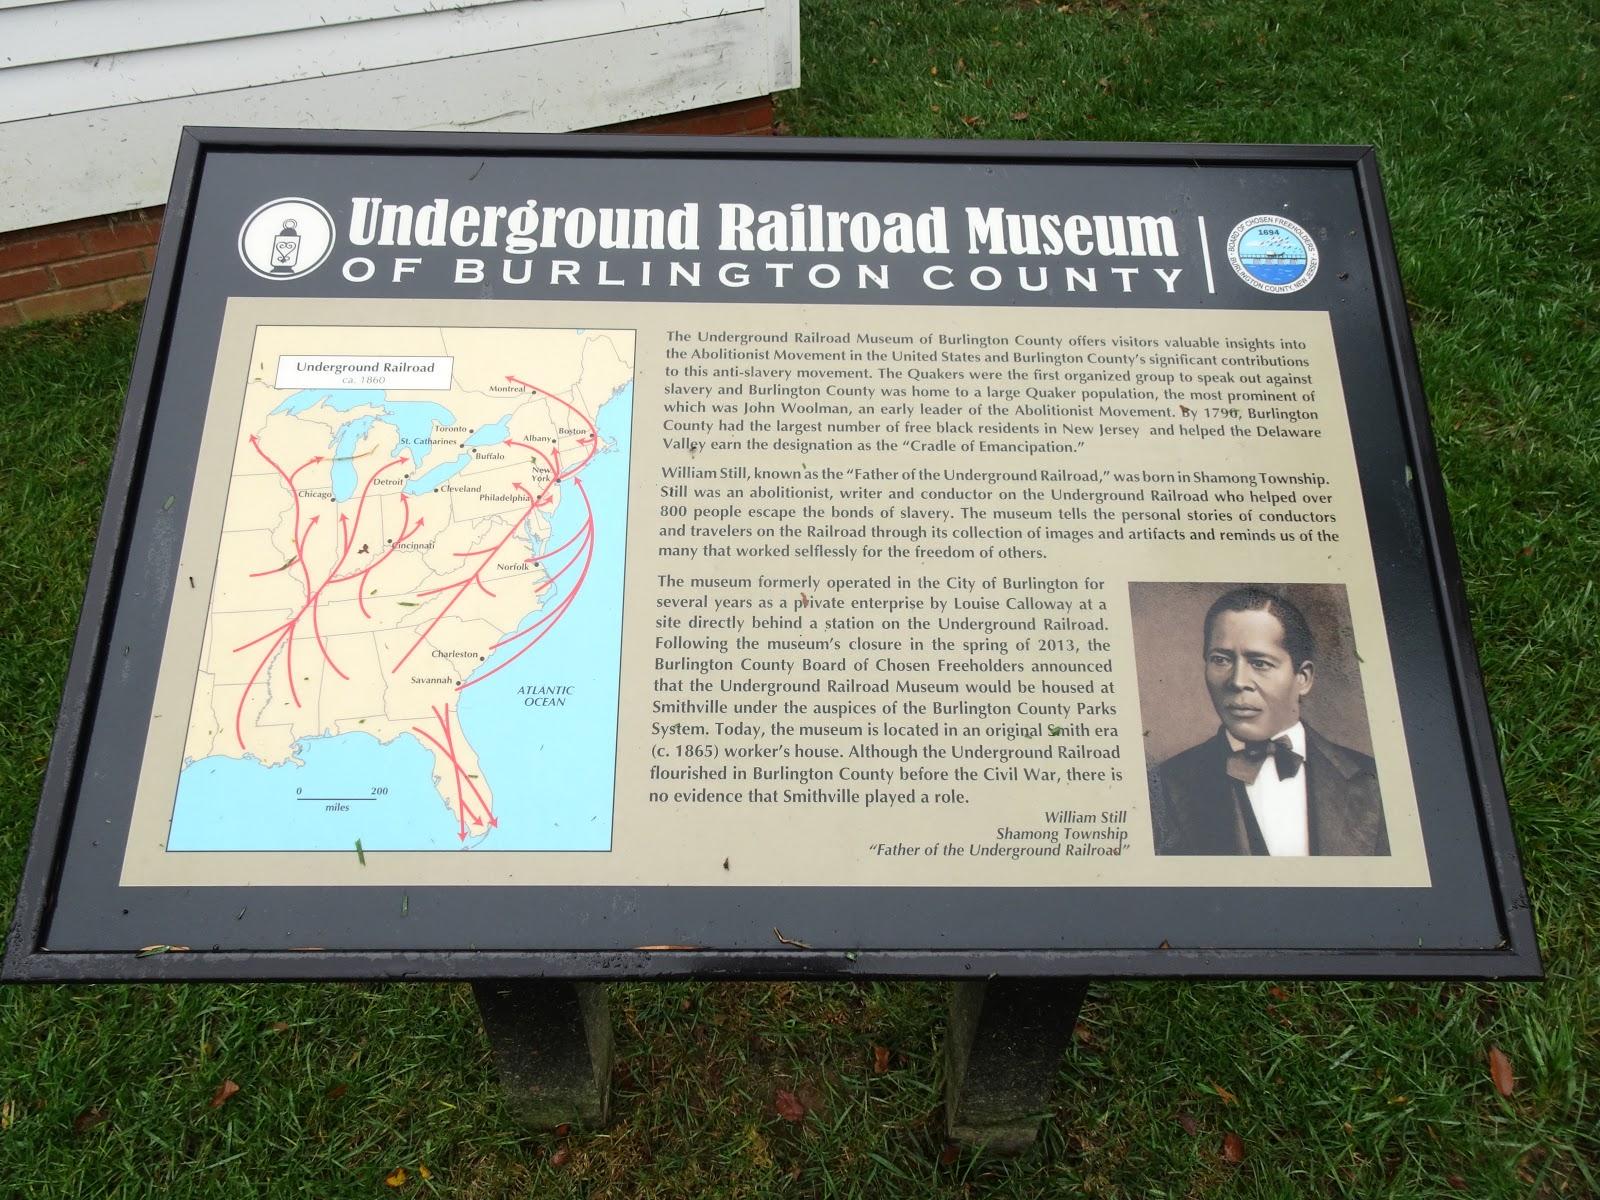 Final Stop John Brown Freedom Trail 1859 in Iowa - Clio